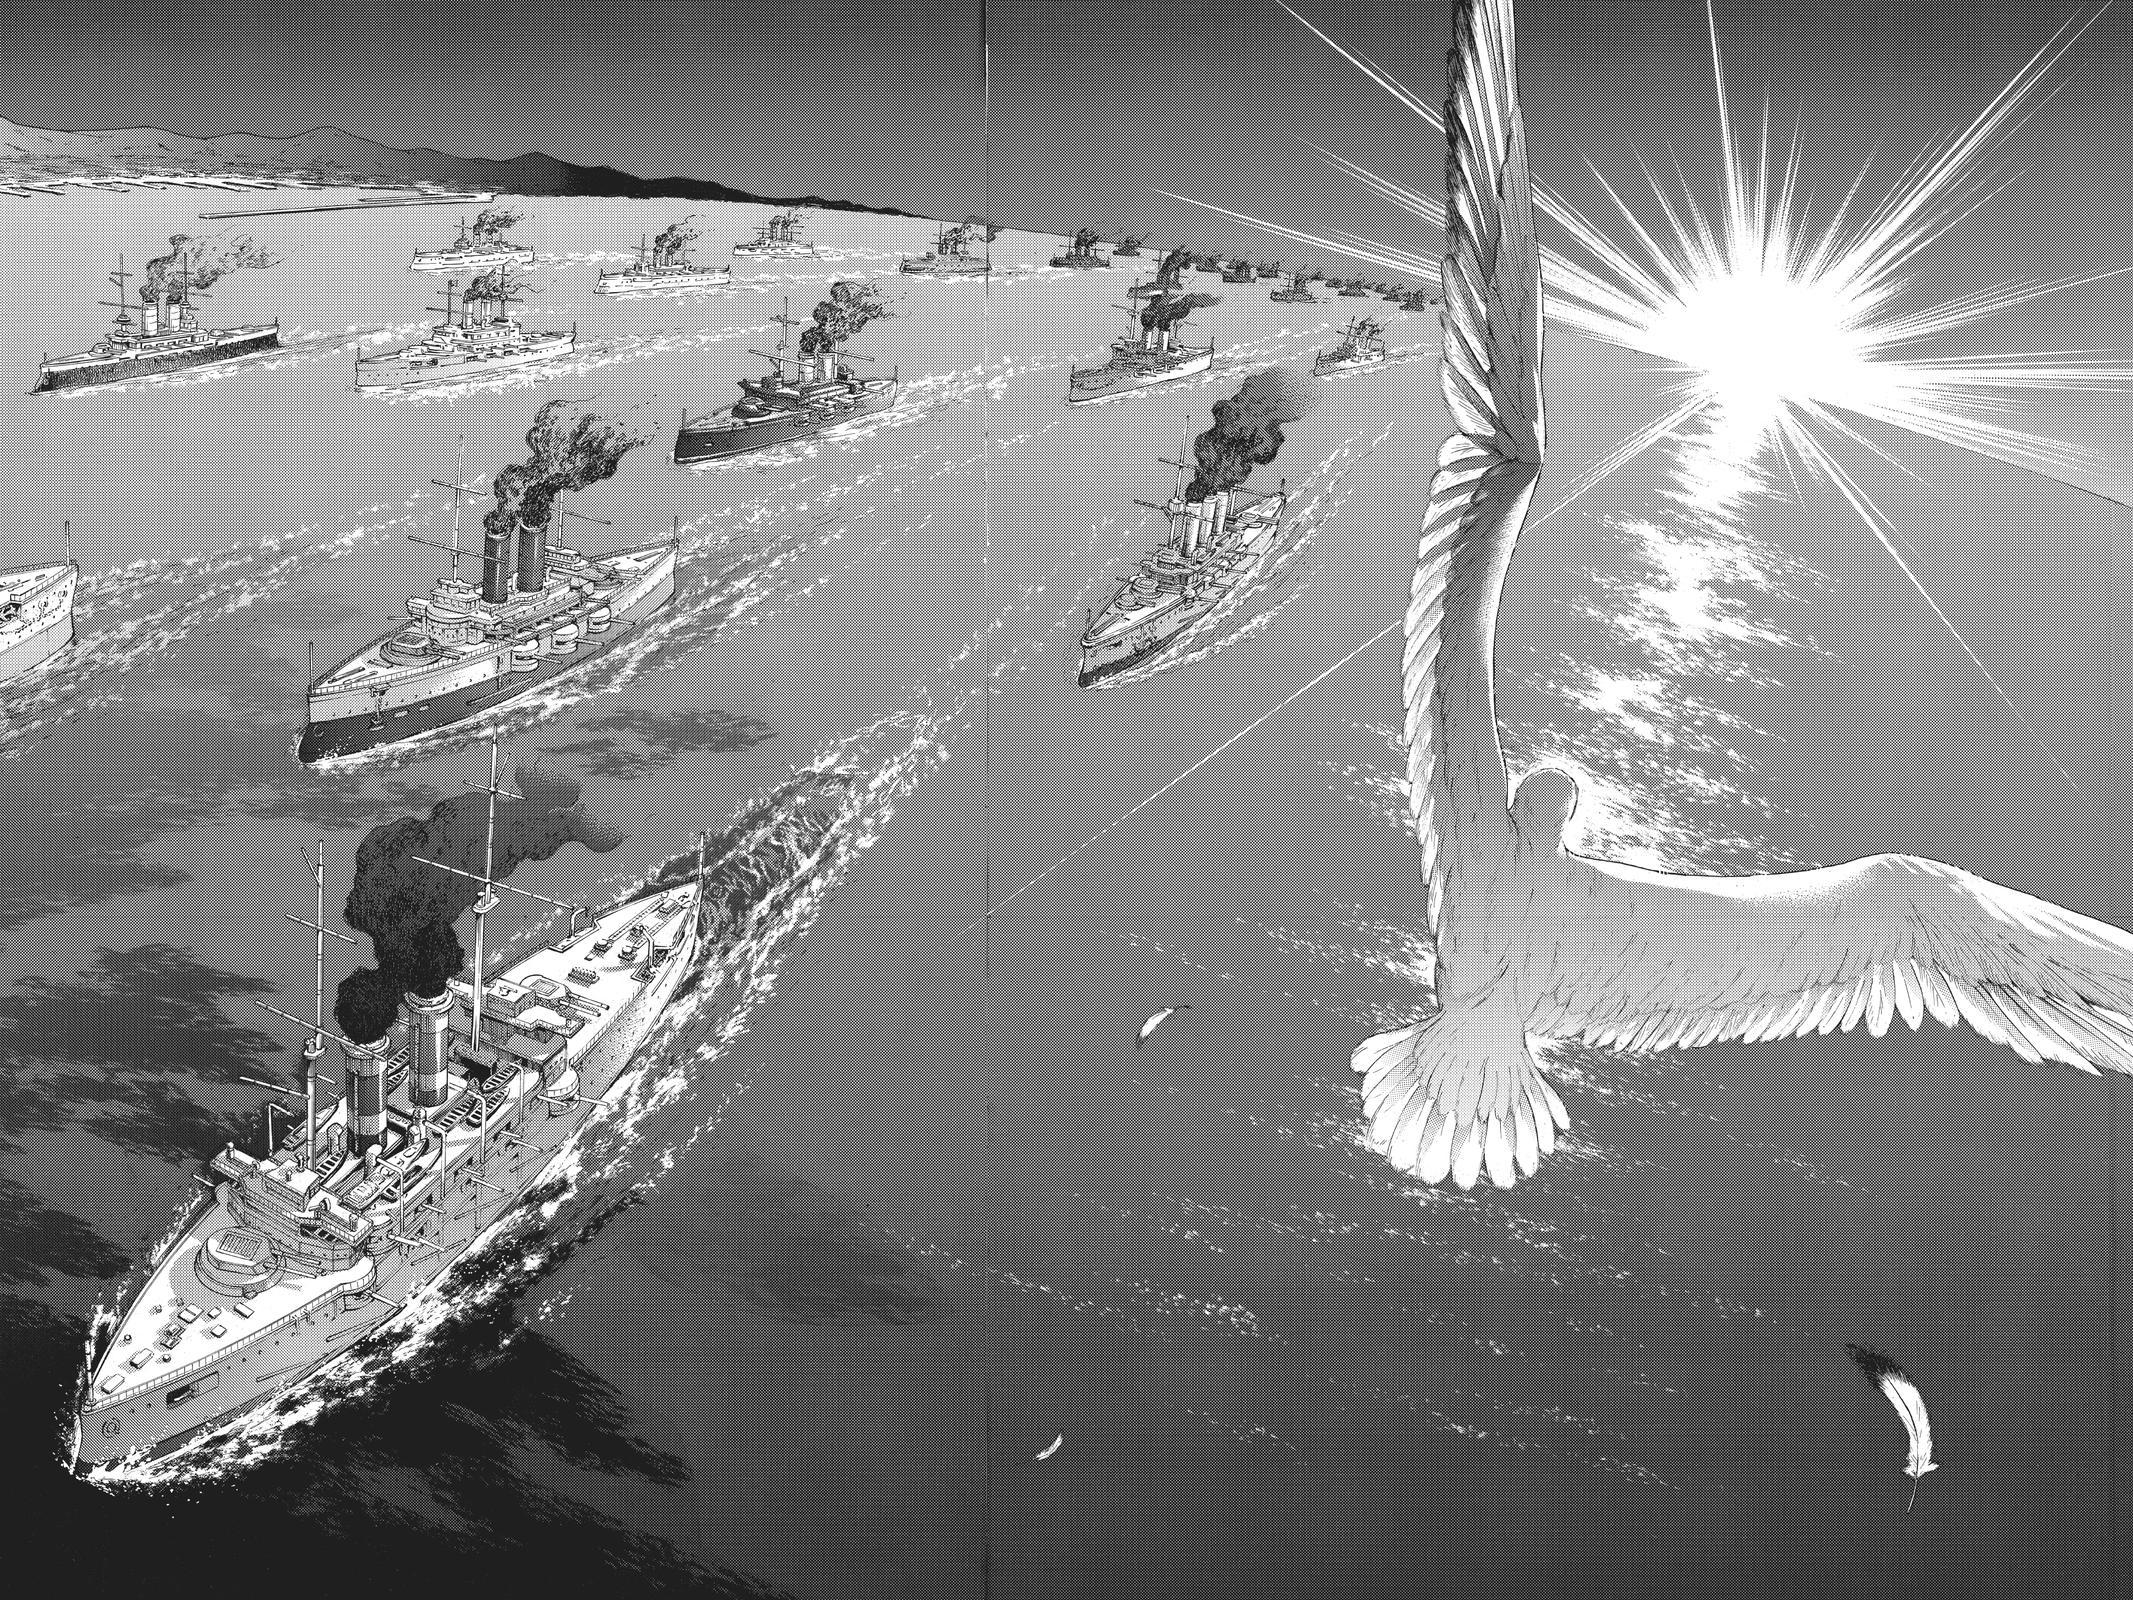 Attack On Titan, Episode 130 image 019